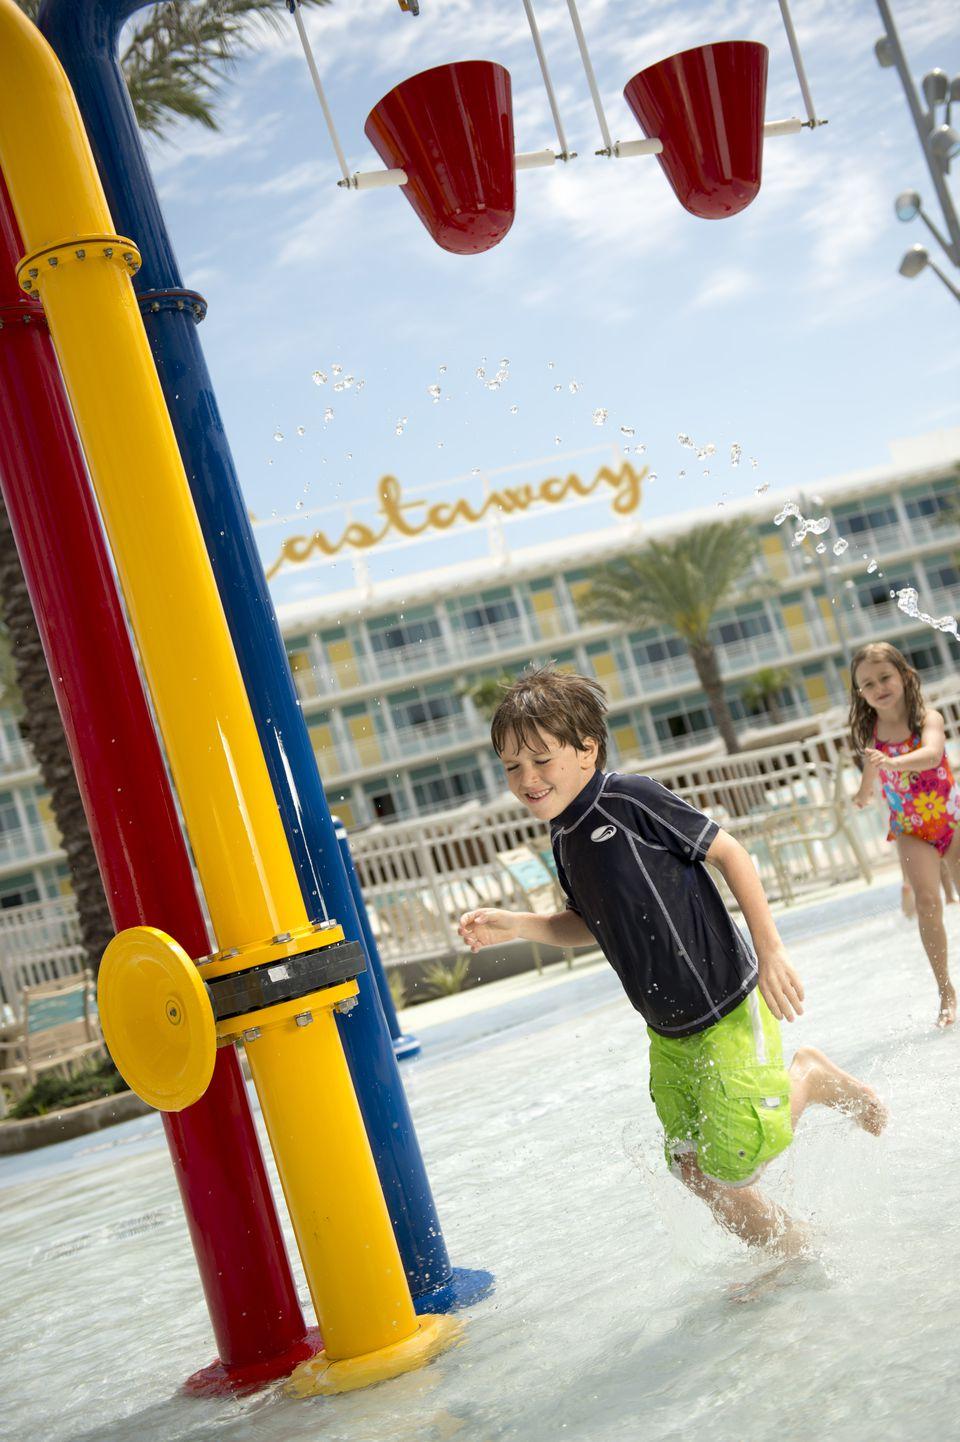 Cabana Courtyard kids area at Universal Orlando's Cabana Bay Beach Resort.